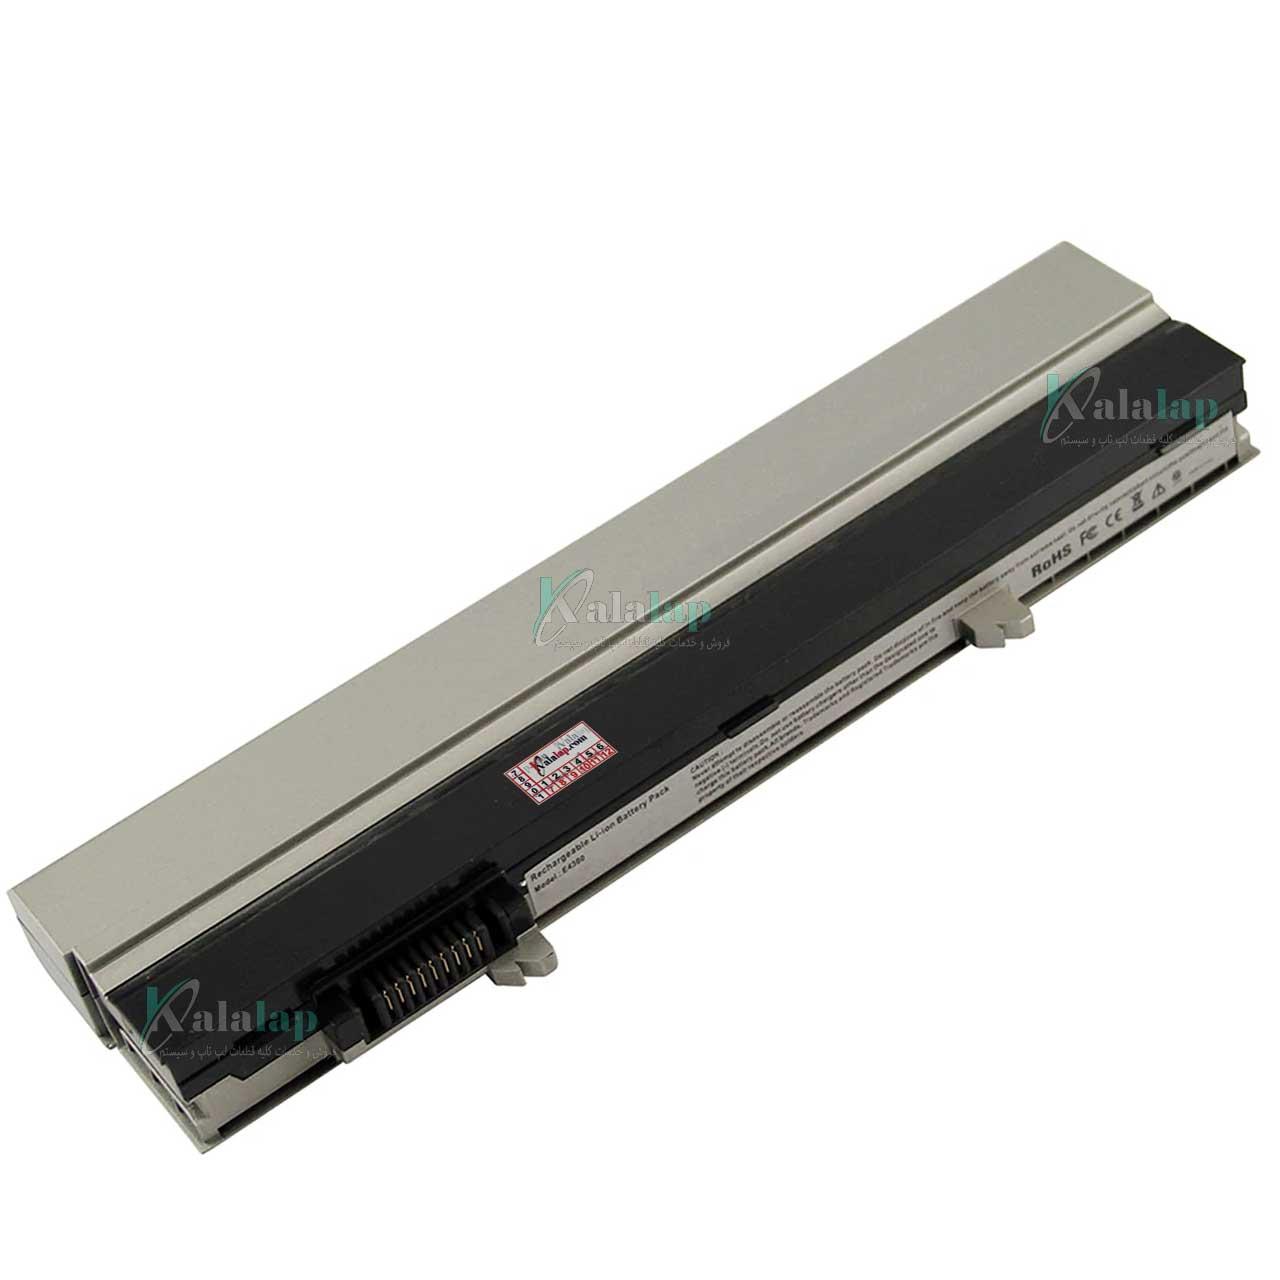 باتری لپ تاپ دل Battery Laptop Dell Latitude E4300